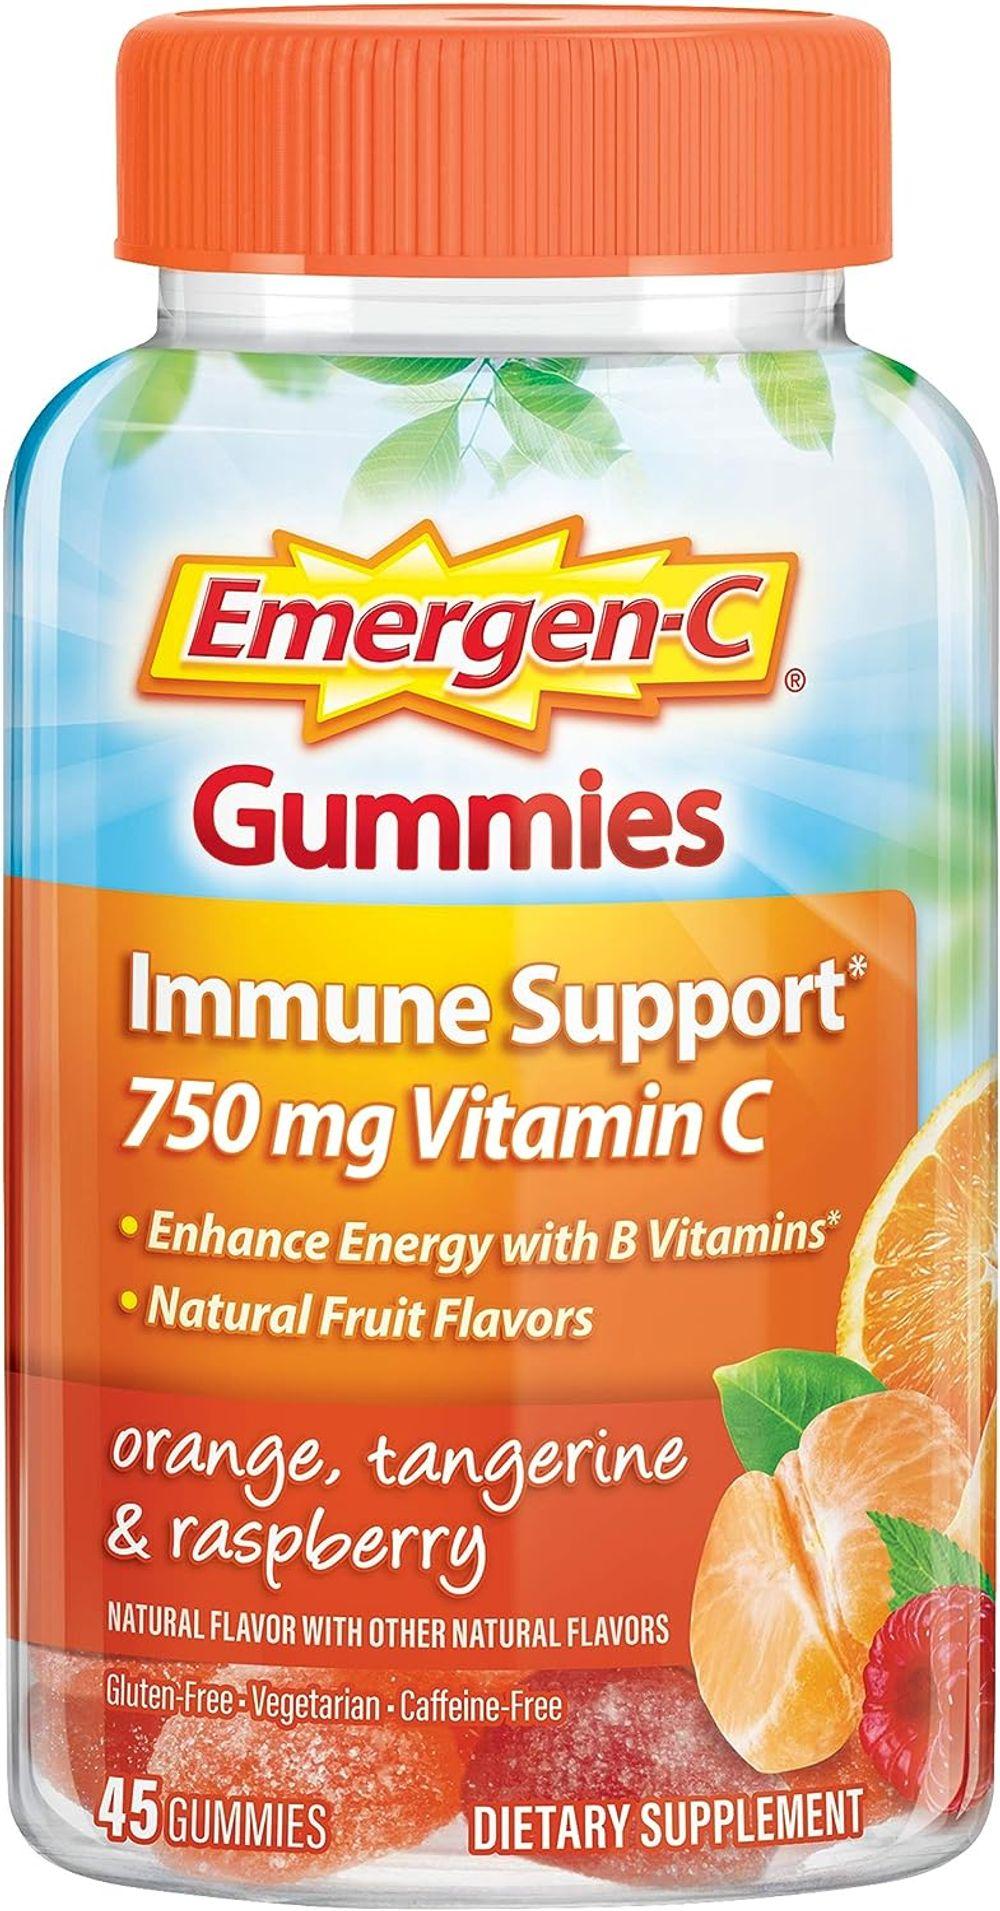 Emergen-C 750mg Vitamin C Gummies for Adults, Immunity Gummies with B Vitamins, Gluten Free, Orange, Tangerine and Raspberry Flavors - 45 Count